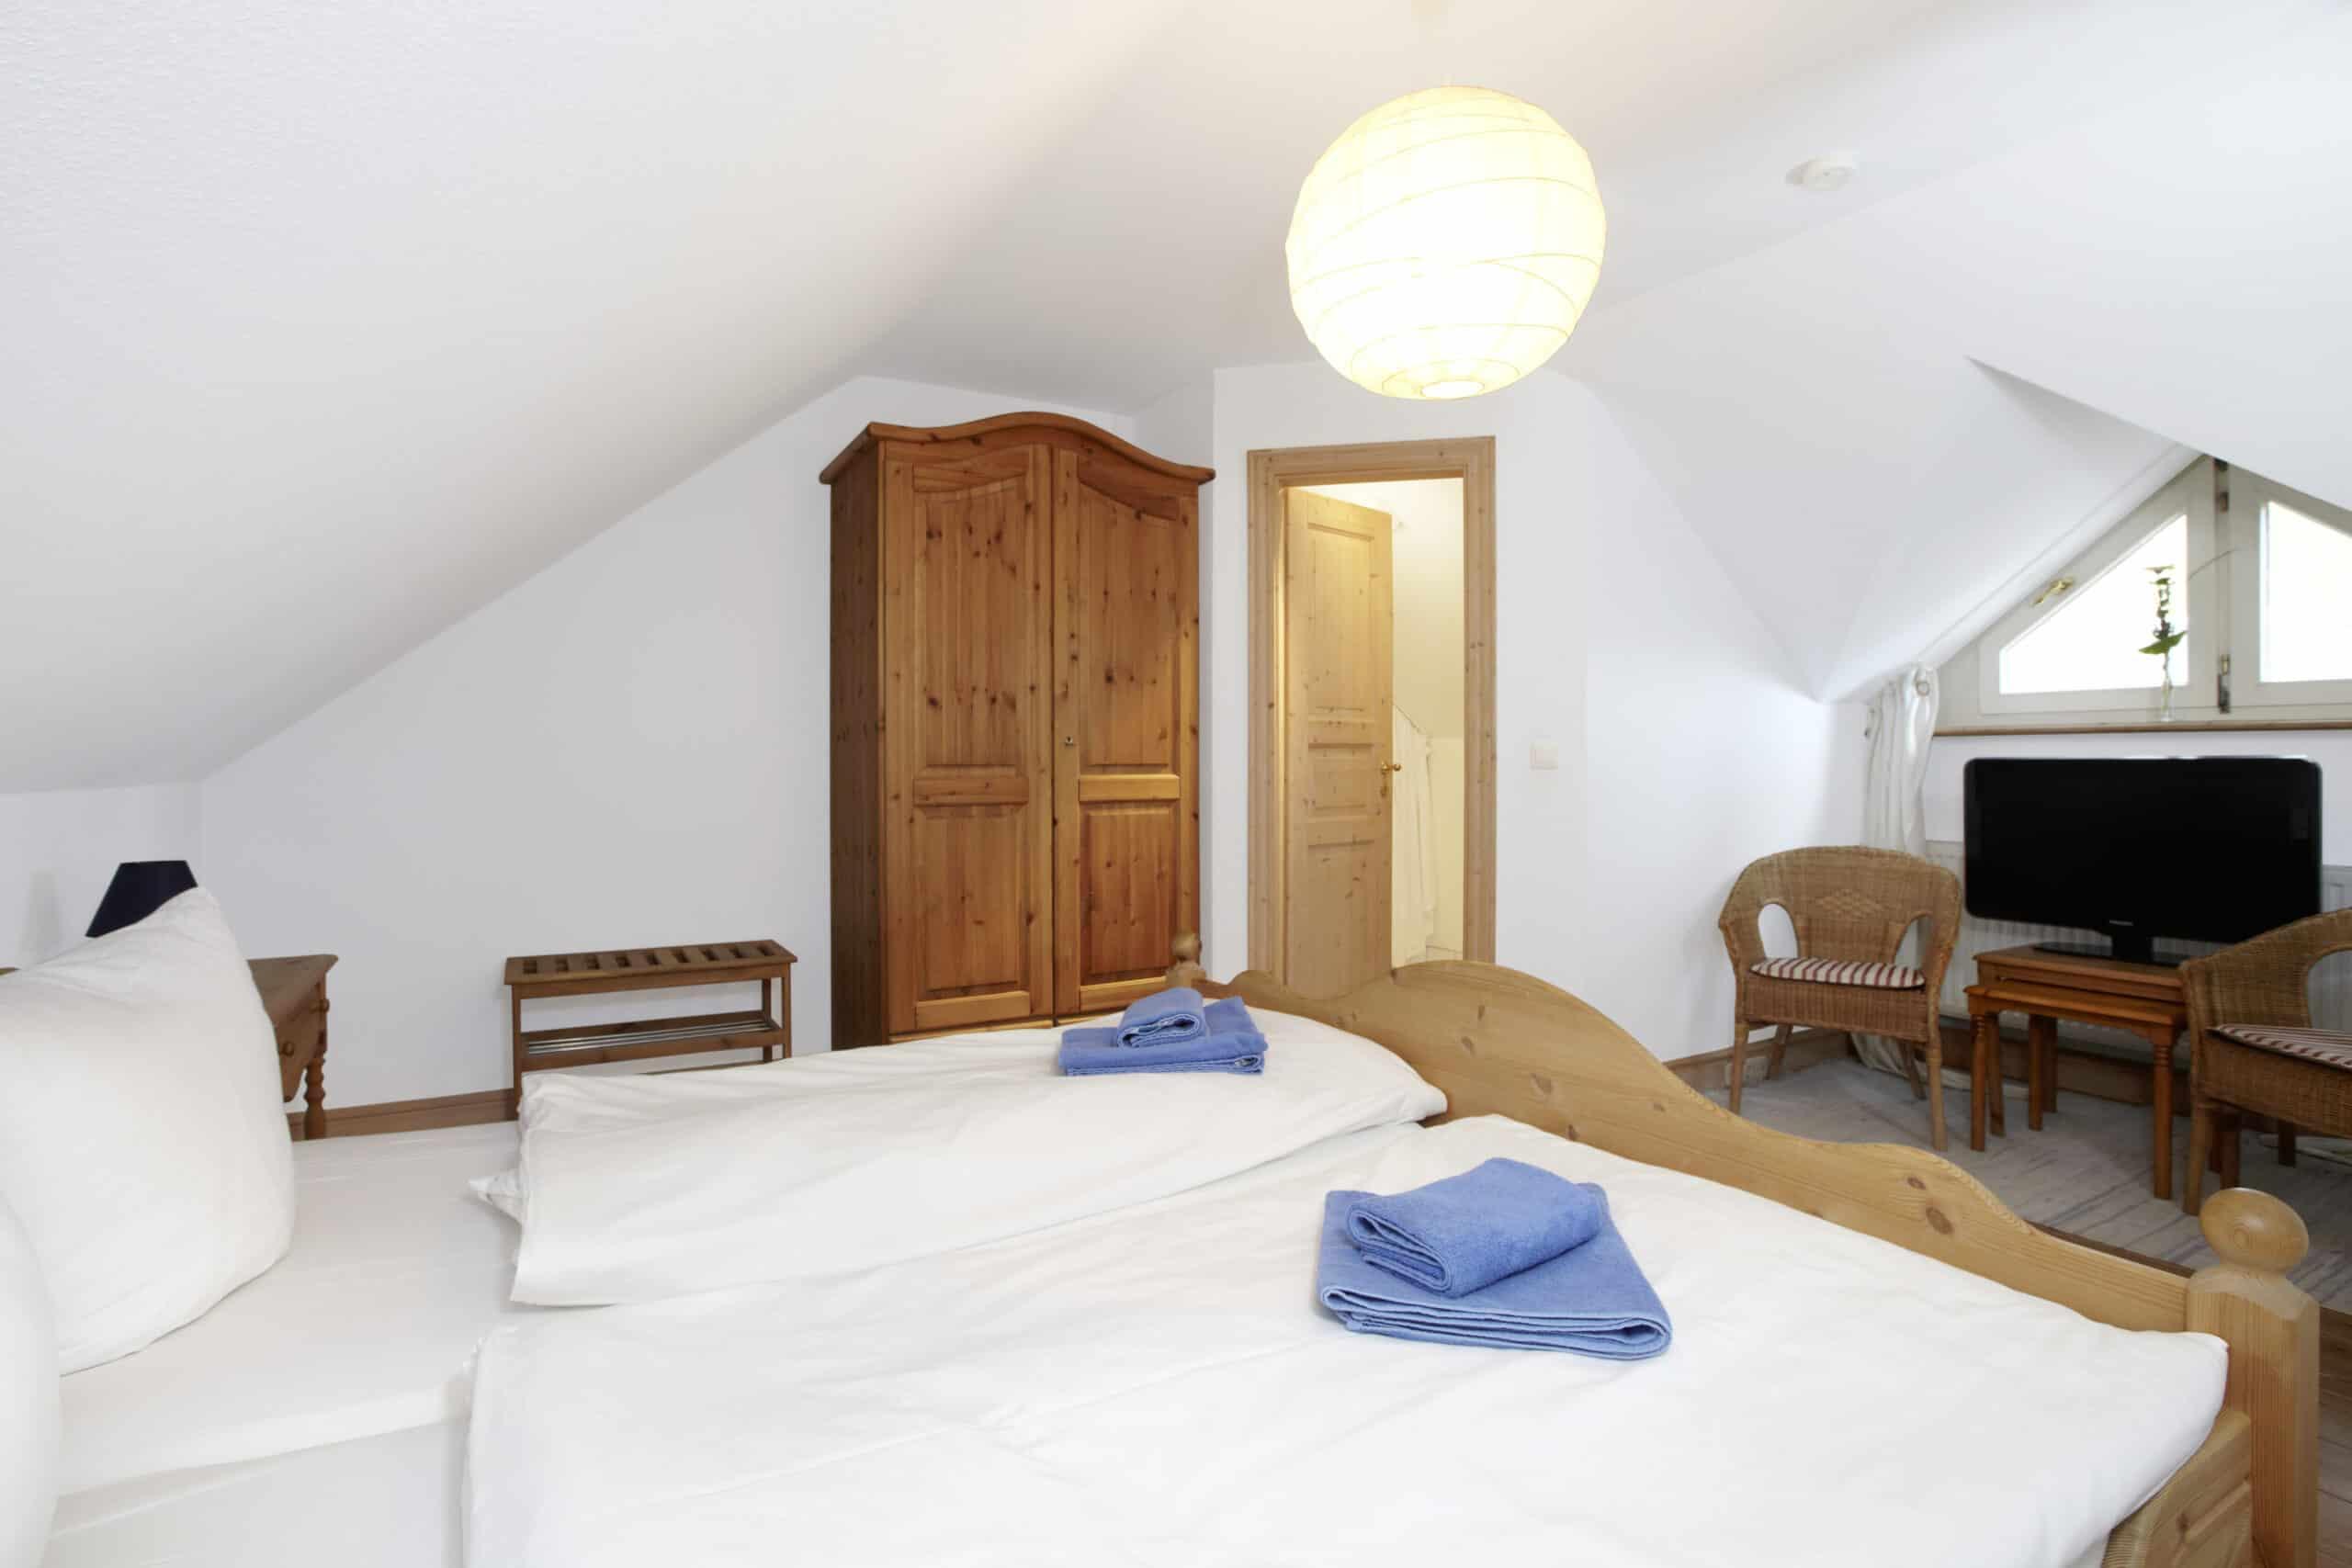 Strandhaeuser Blankenfohrt Schlafzimmer 04 scaled